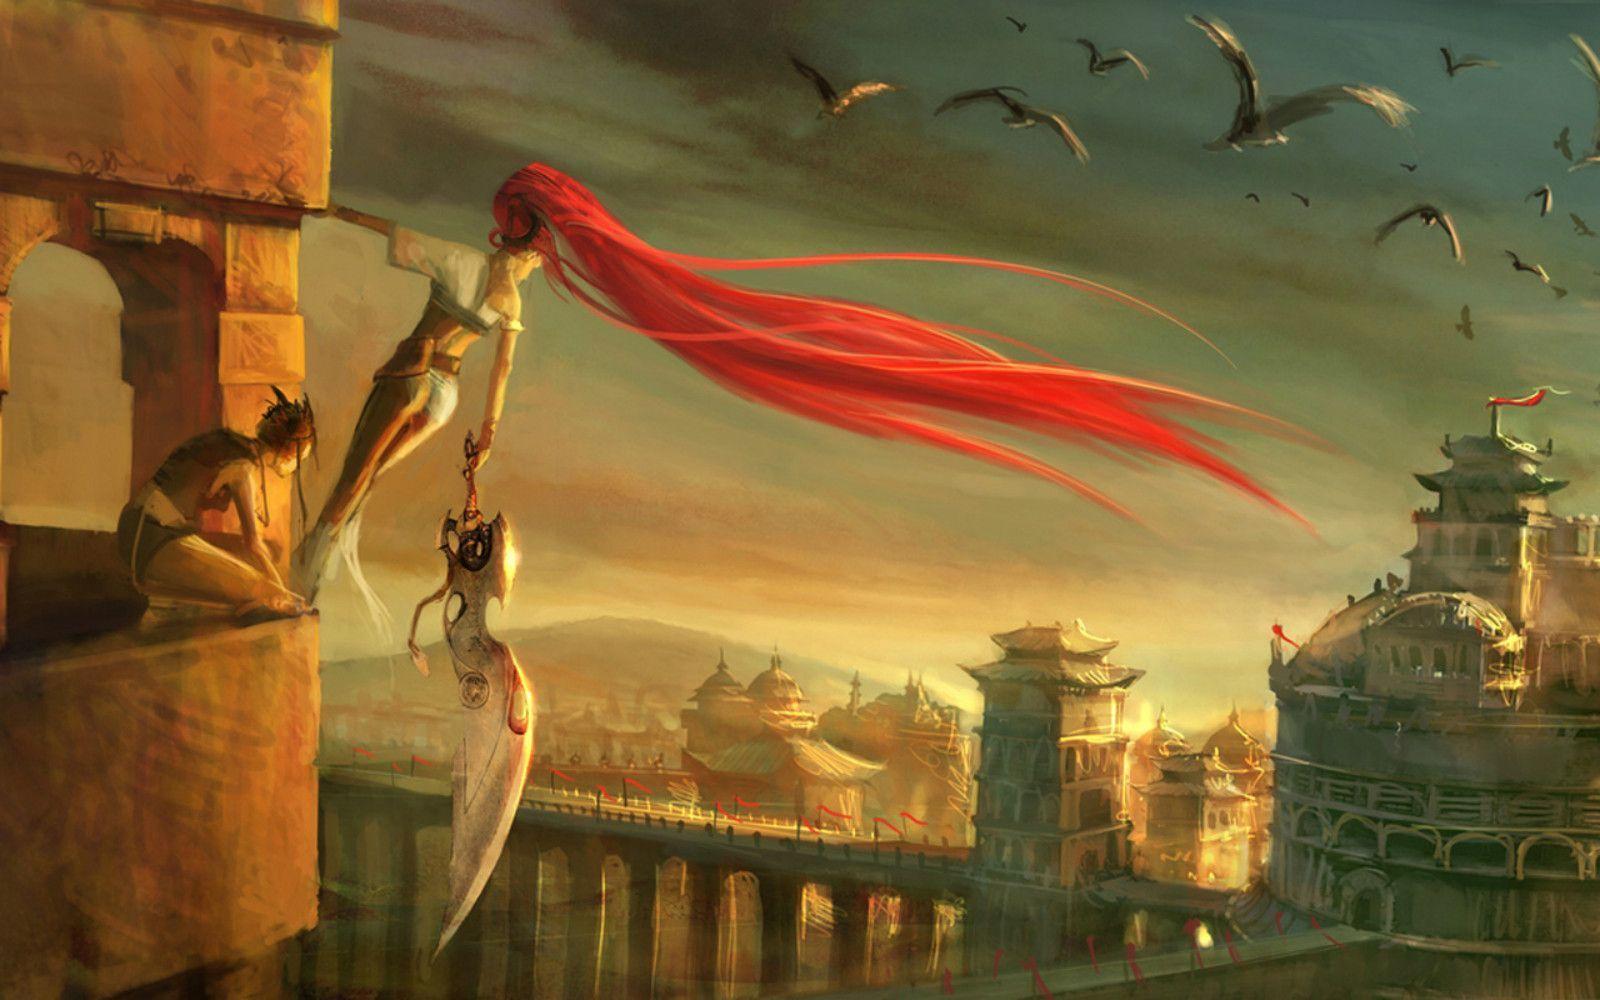 3d Sword Games Hd Wallpaper For Mobile: Heavenly Sword Wallpapers HD